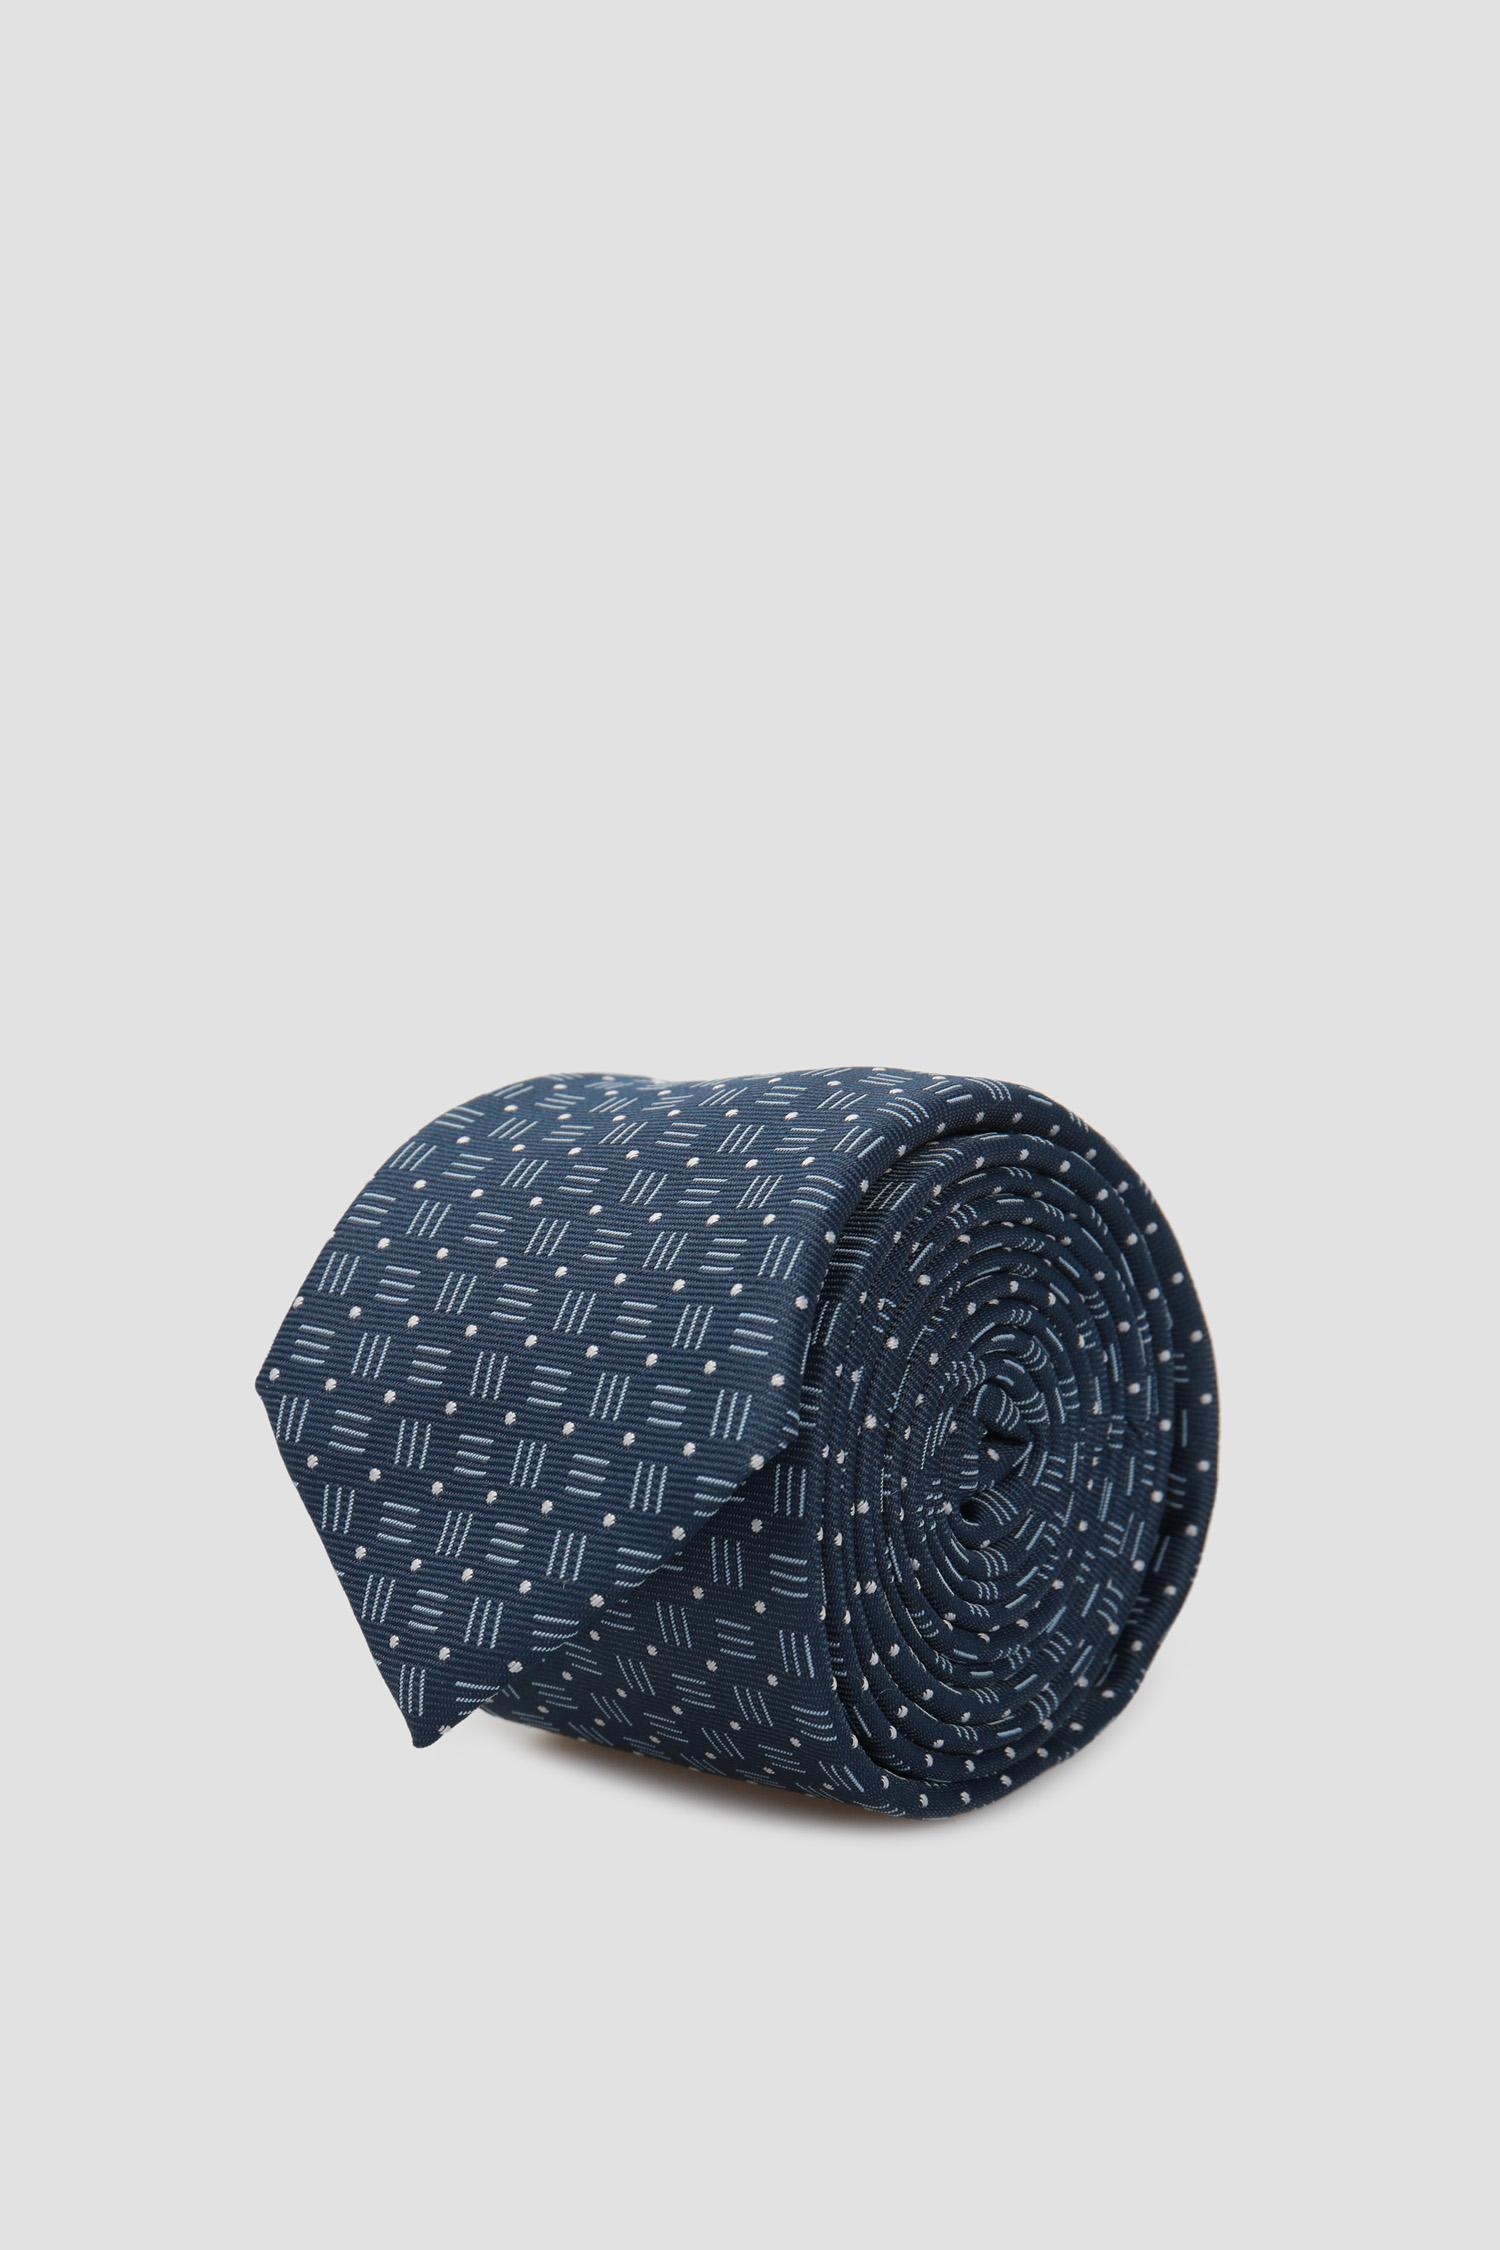 Мужской синий галстук с узором BOSS 50434855;403